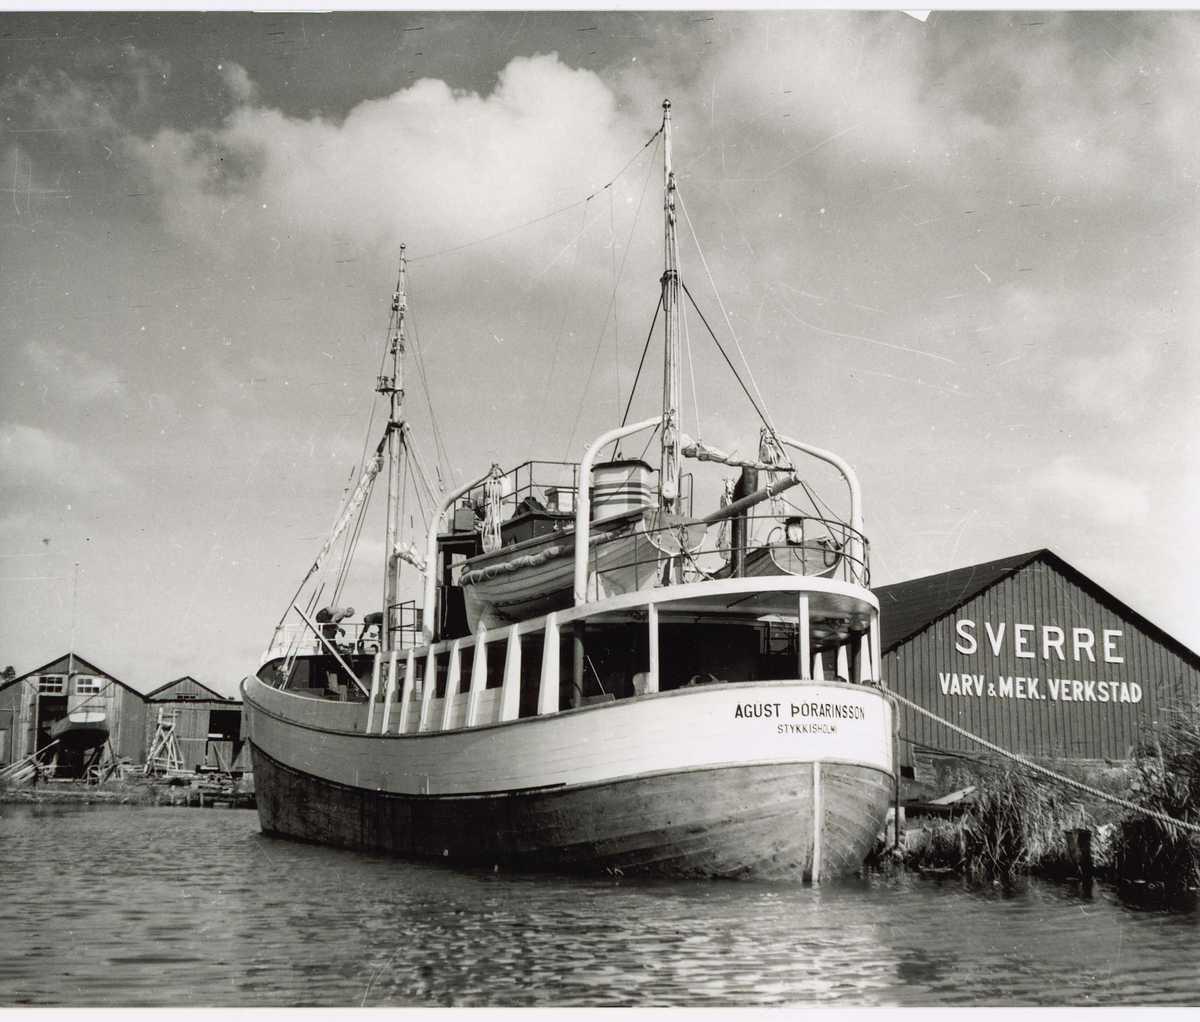 Sverre1.jpg